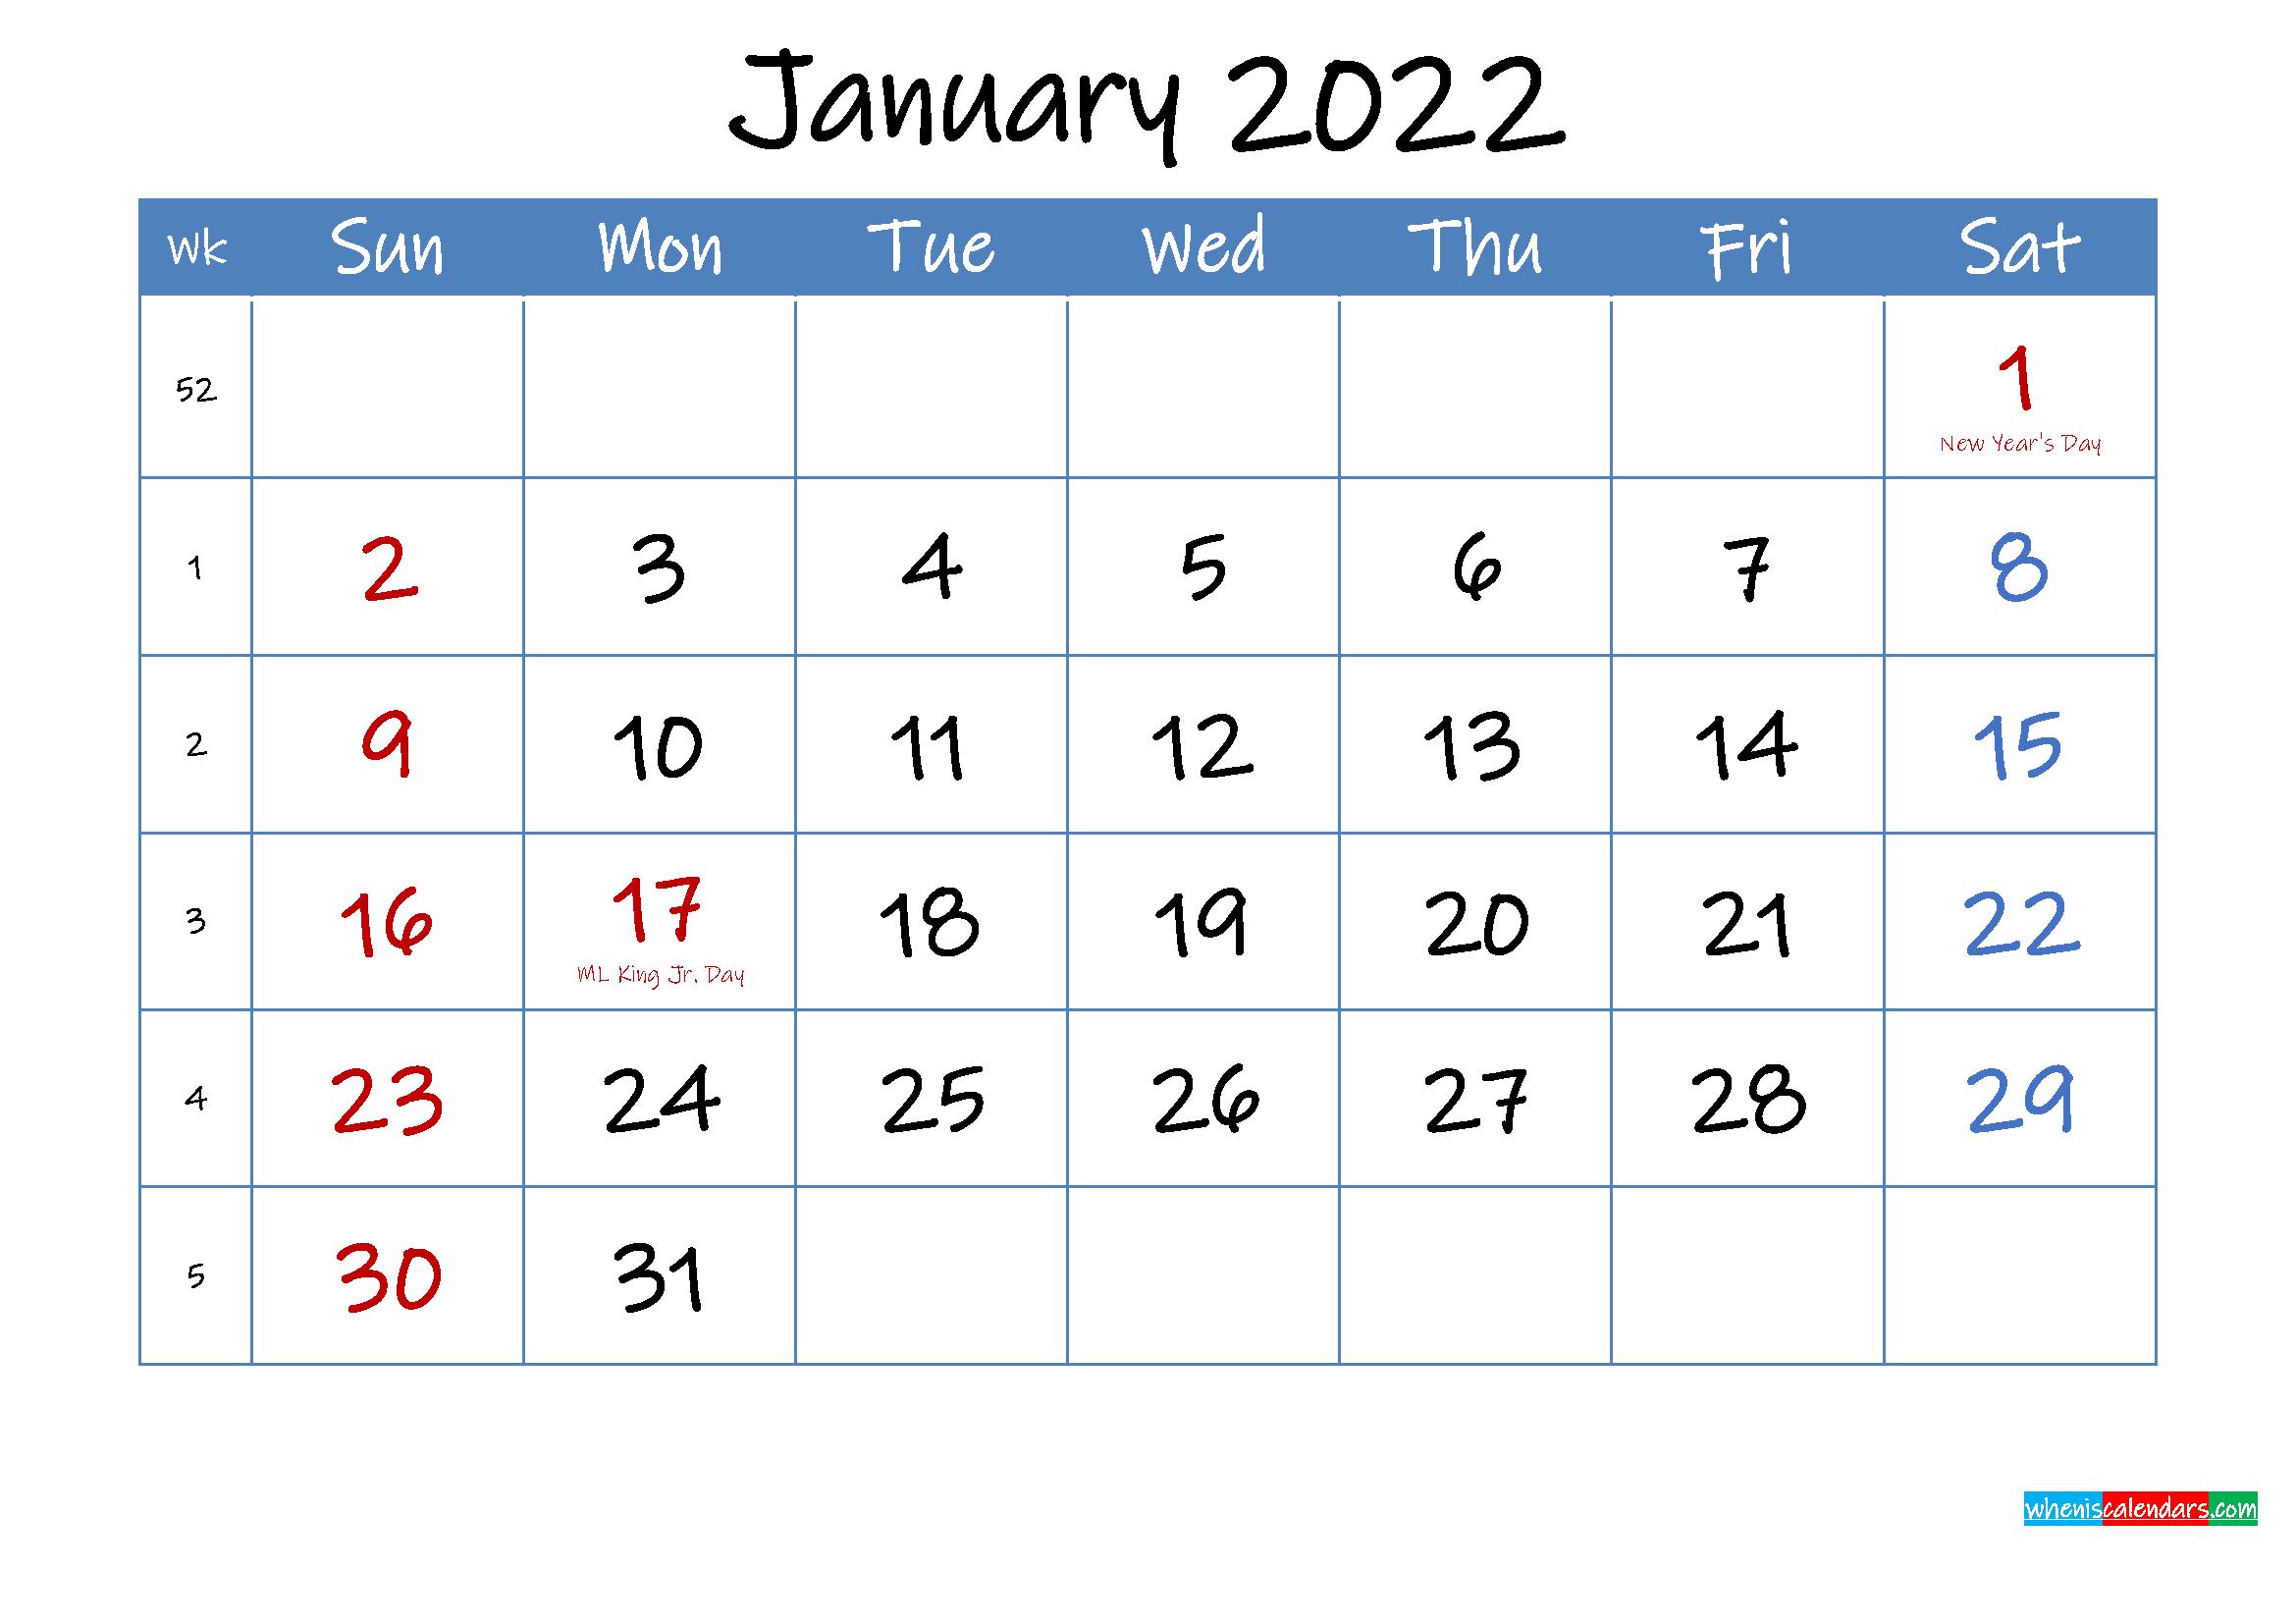 Printable January 2022 Calendar Word - Template Ink22M13 With Regard To Blank Calendar January 2022 Printable